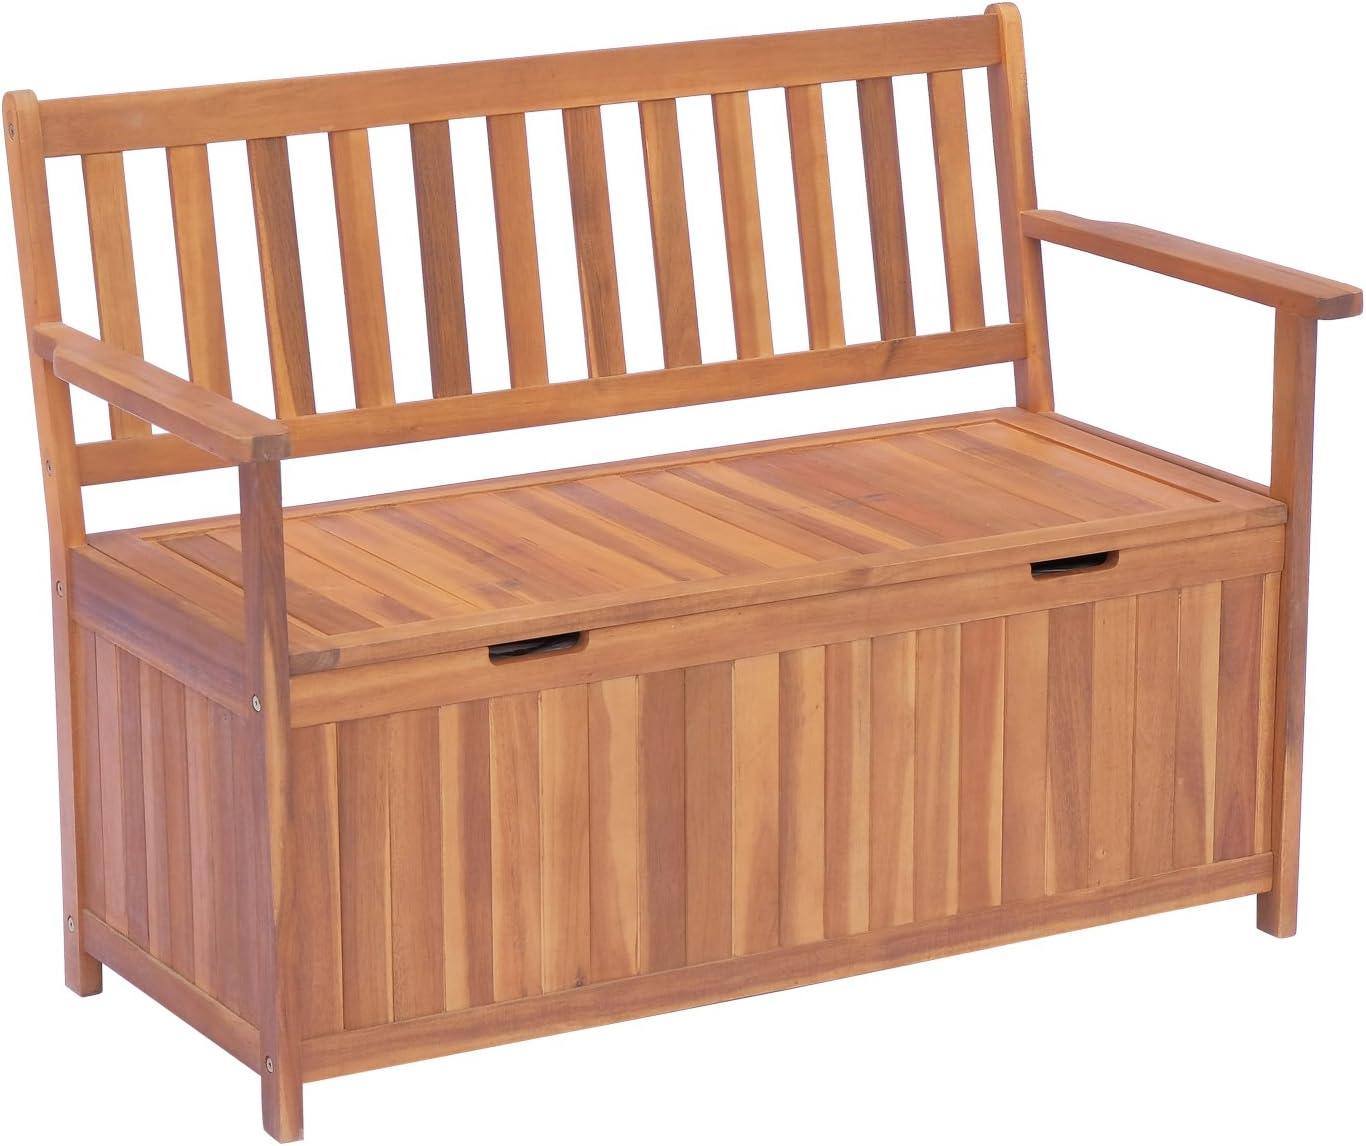 Outsunny Gartenbank Truhenbank Sitzbank mit Stauraum 20 Sitzer Holz Braun  B200 x T20 x H20cm